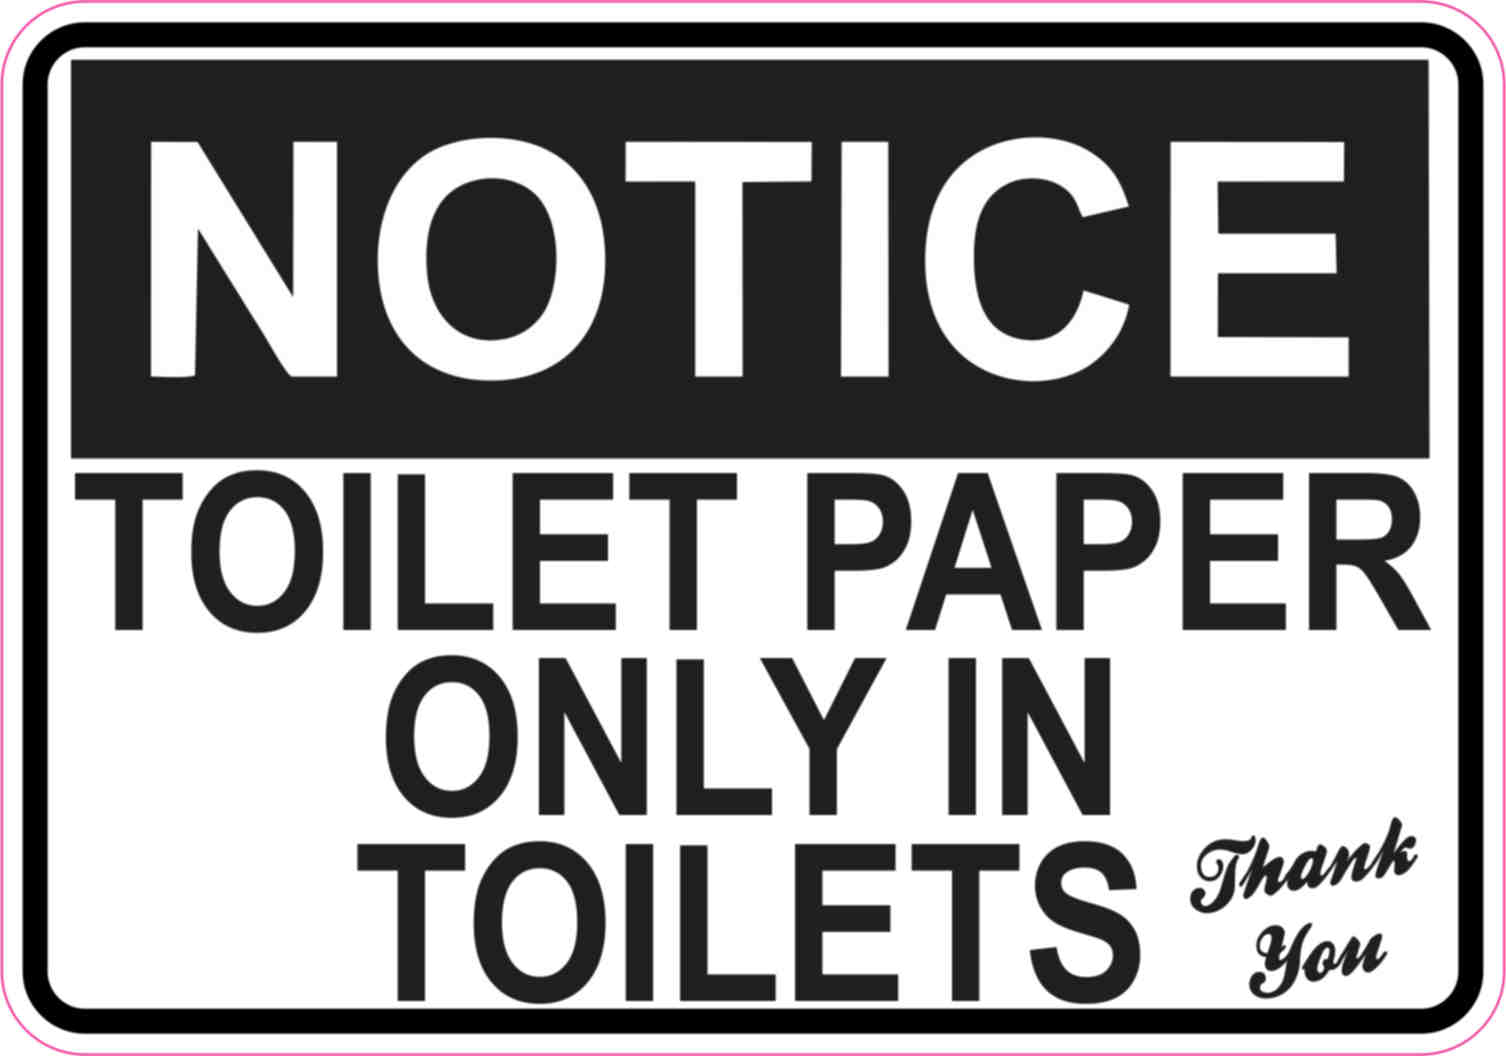 Best 5in x 3.5in Toilet Paper Only Sticker Vinyl Restroom Wall Sign  PU33